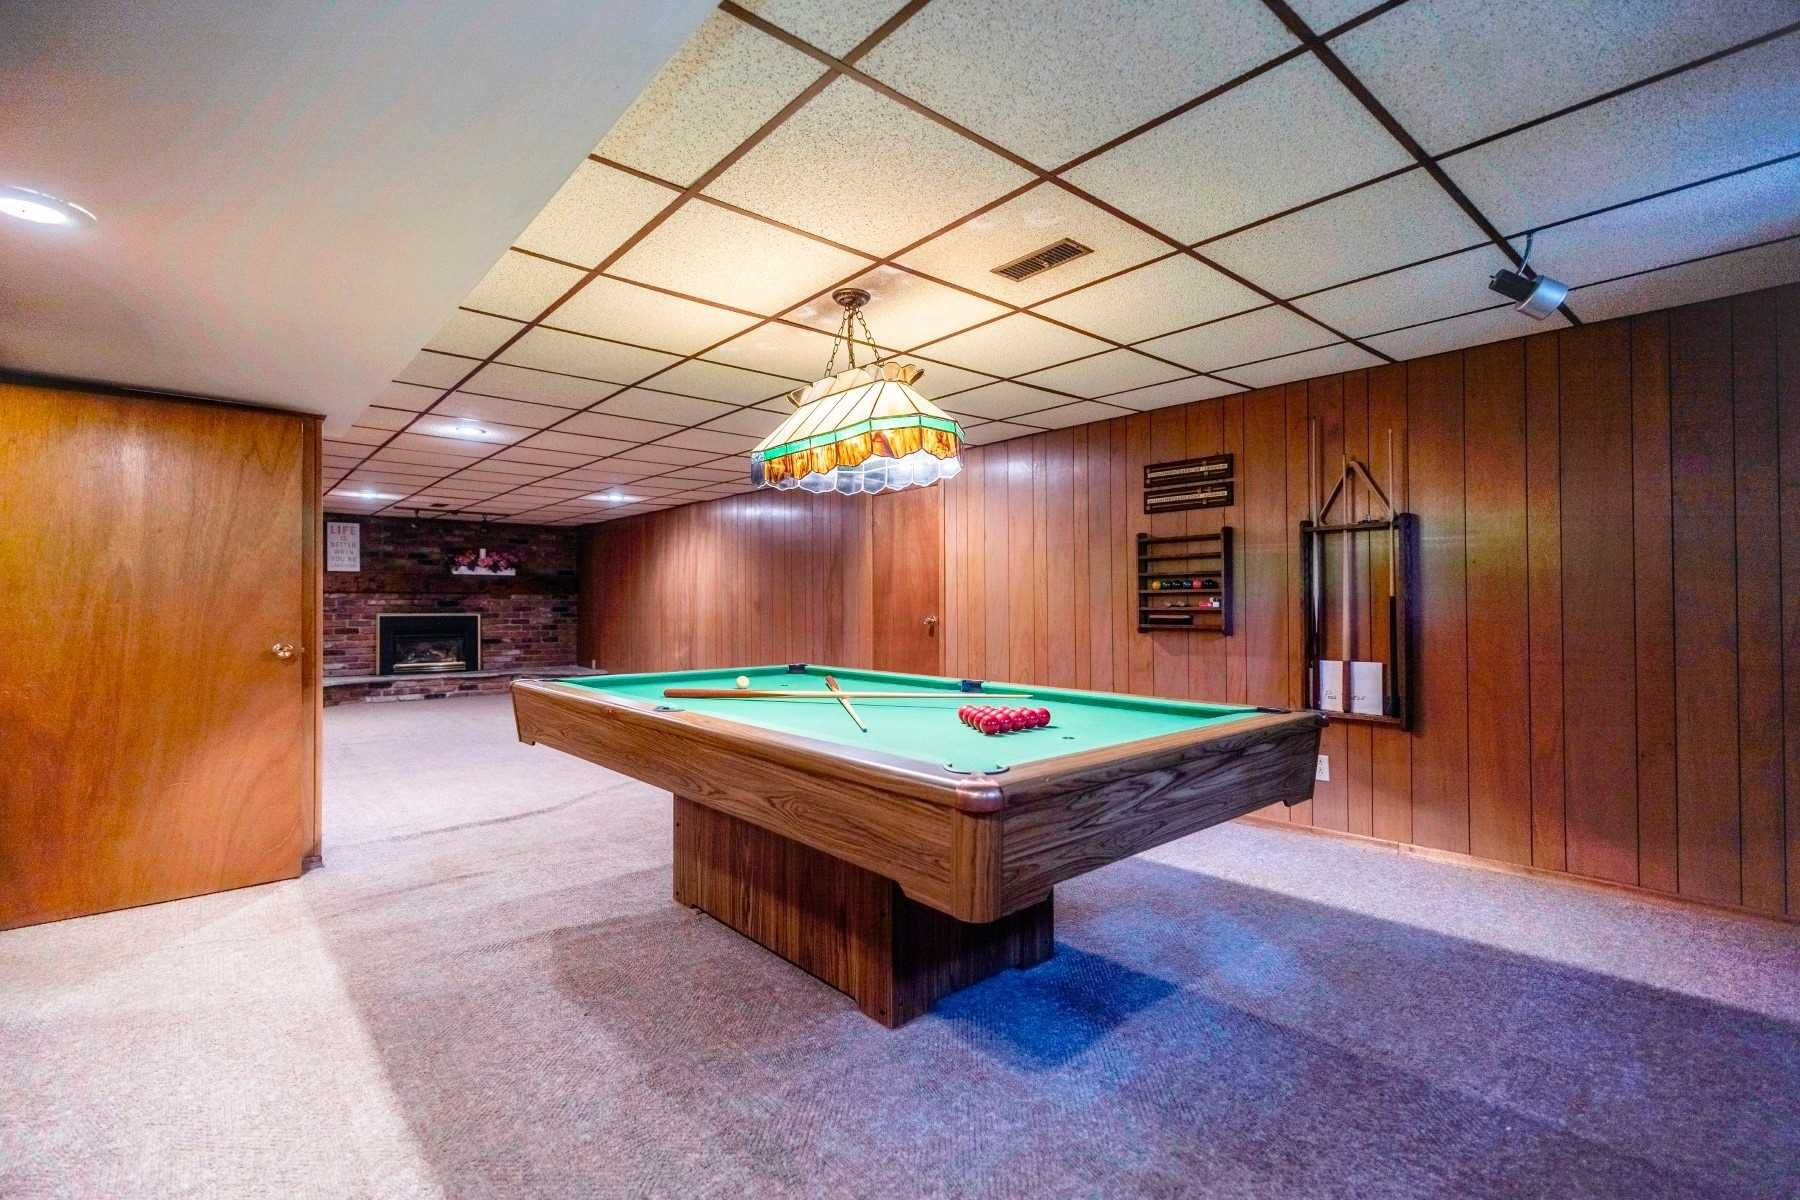 Photo 14: Photos: 1140 Northridge Street in Oshawa: Centennial House (Bungalow) for sale : MLS®# E4571459